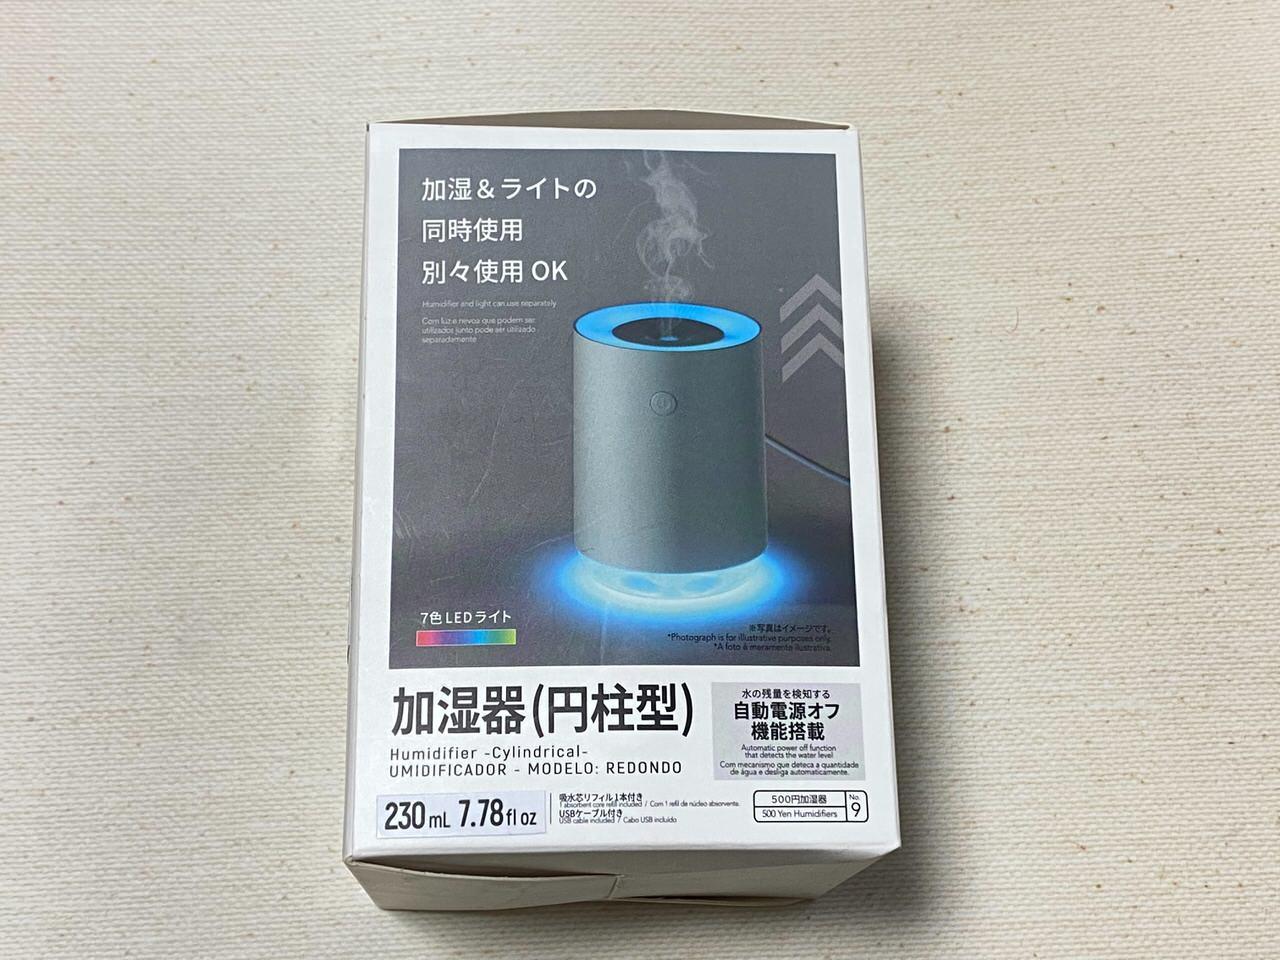 USBで給電するダイソーの500円加湿器を試してみた(円柱型) 3